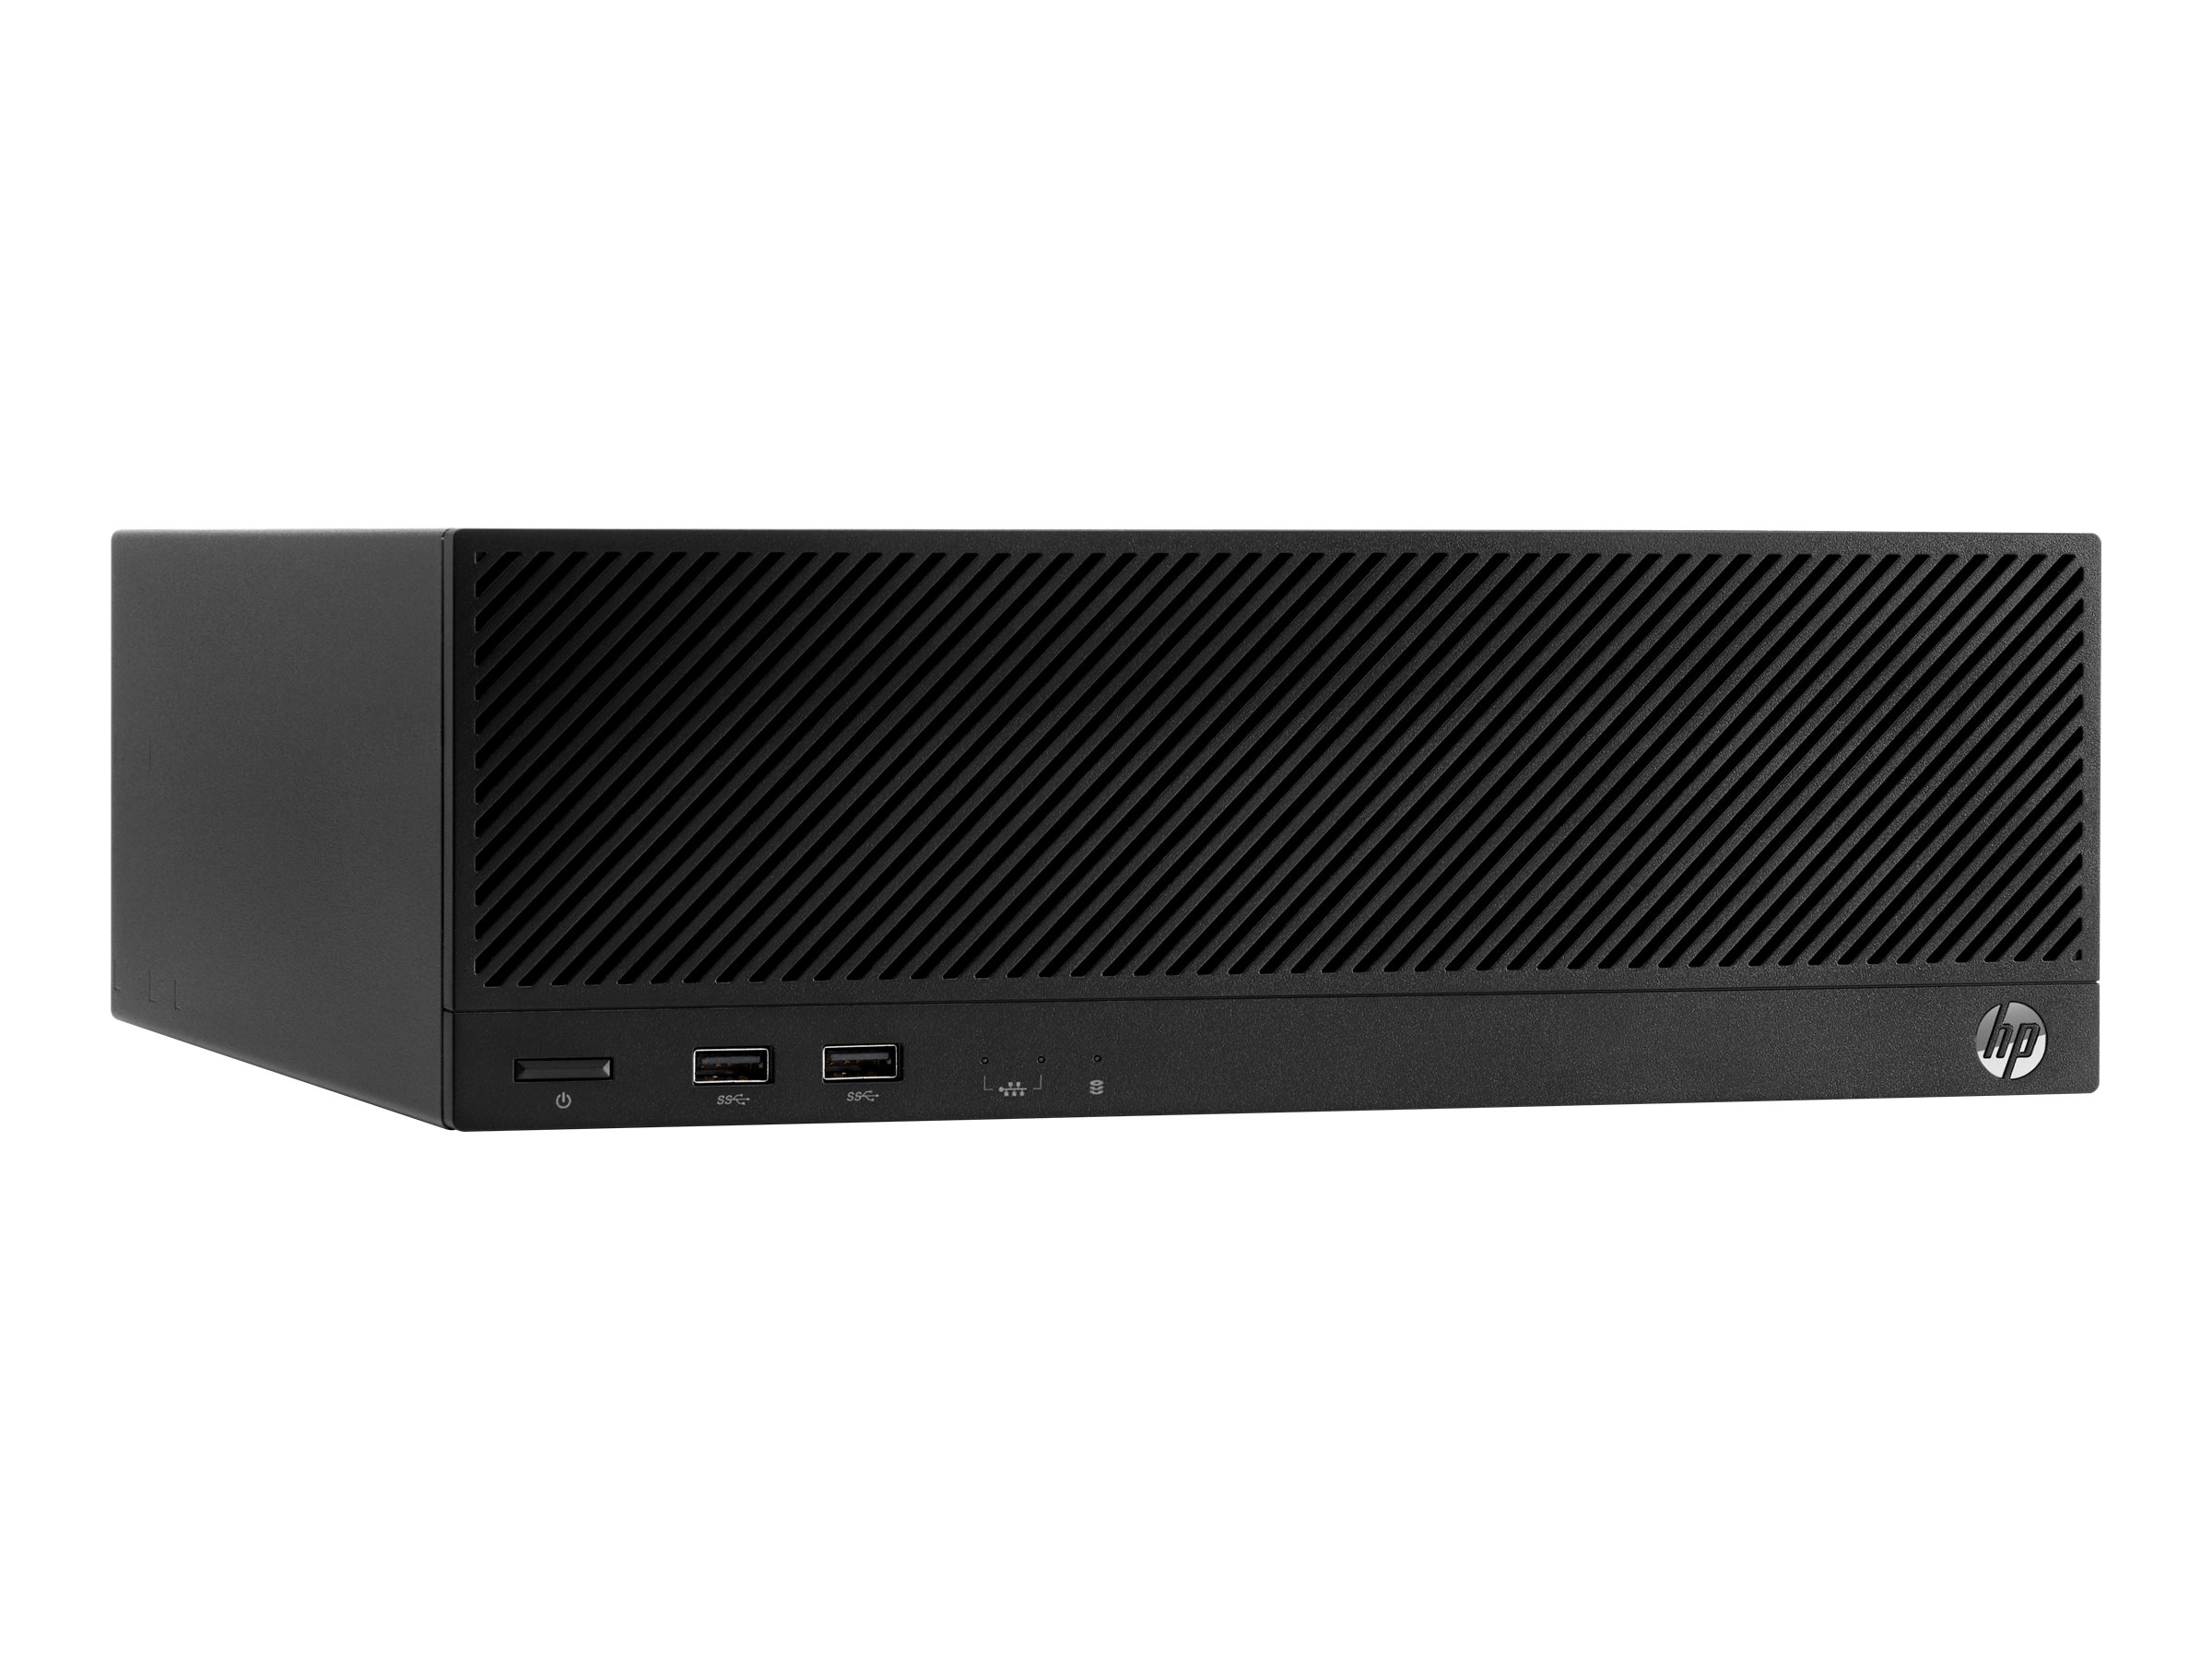 HP Engage Flex Pro-C Retail System - DT - 1 x Core i3 8100 / 3.6 GHz - RAM 4 GB - SSD 128 GB - TLC